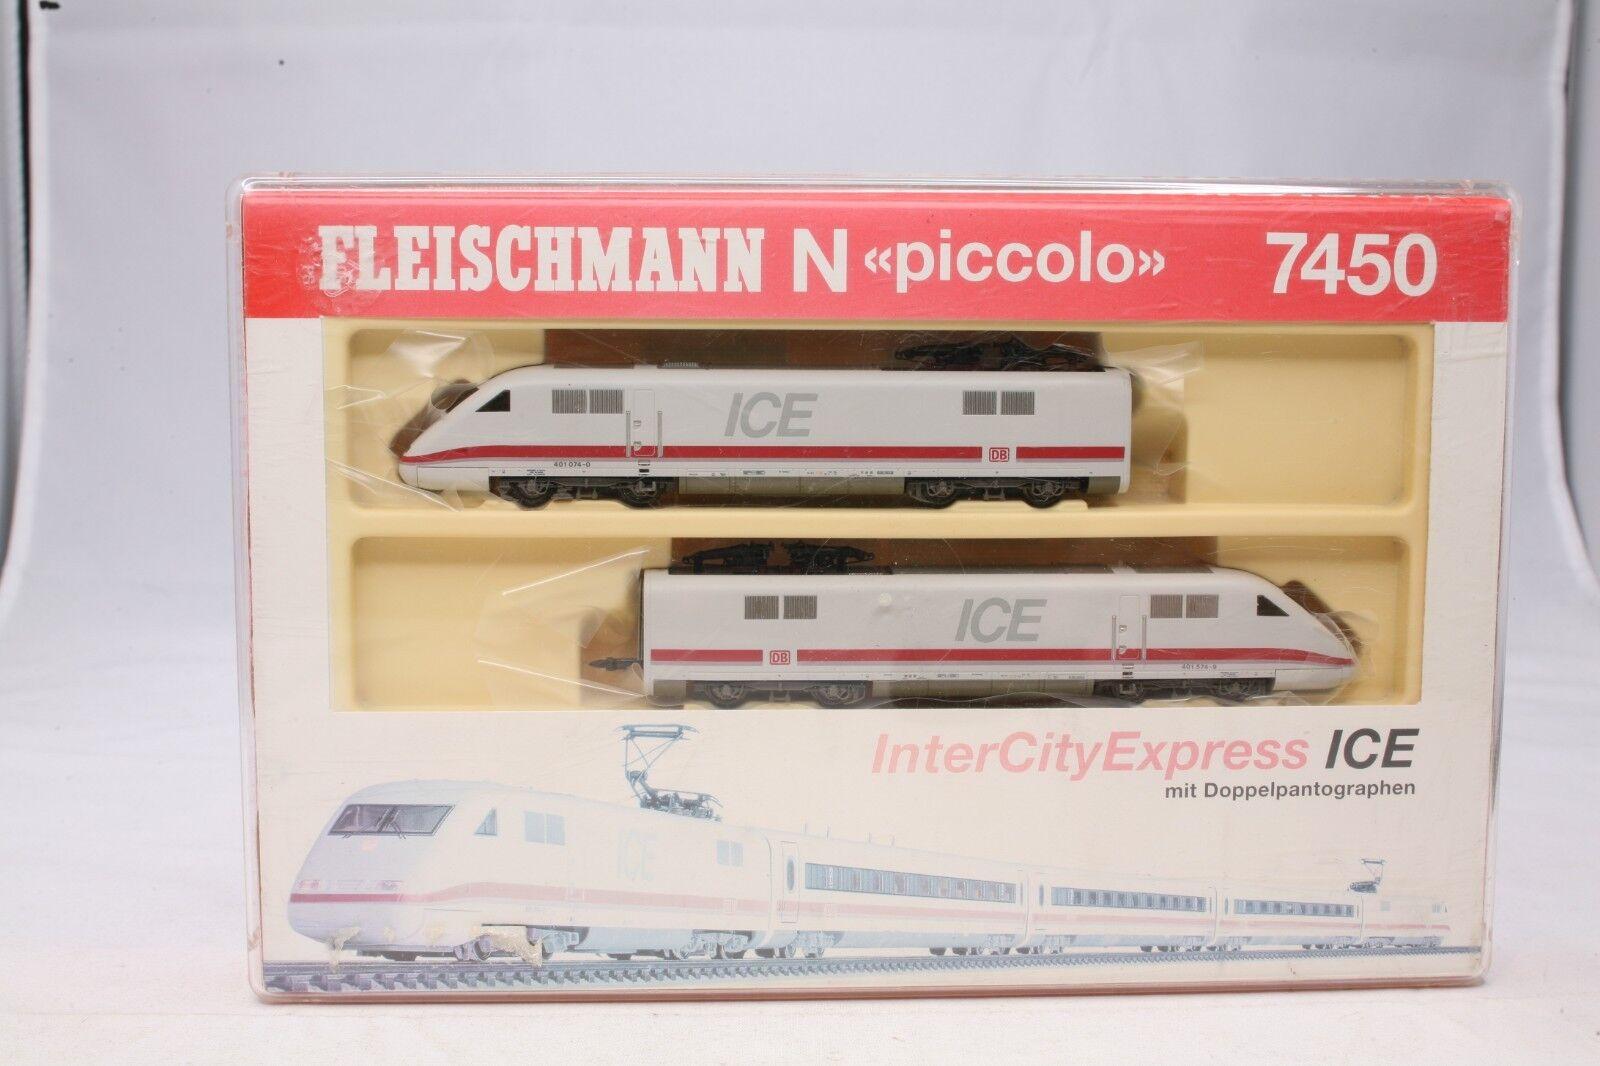 Fleischmann N piccolo 7450 ICE 1 E-Triebzug de la DB Intercity Express 1 160